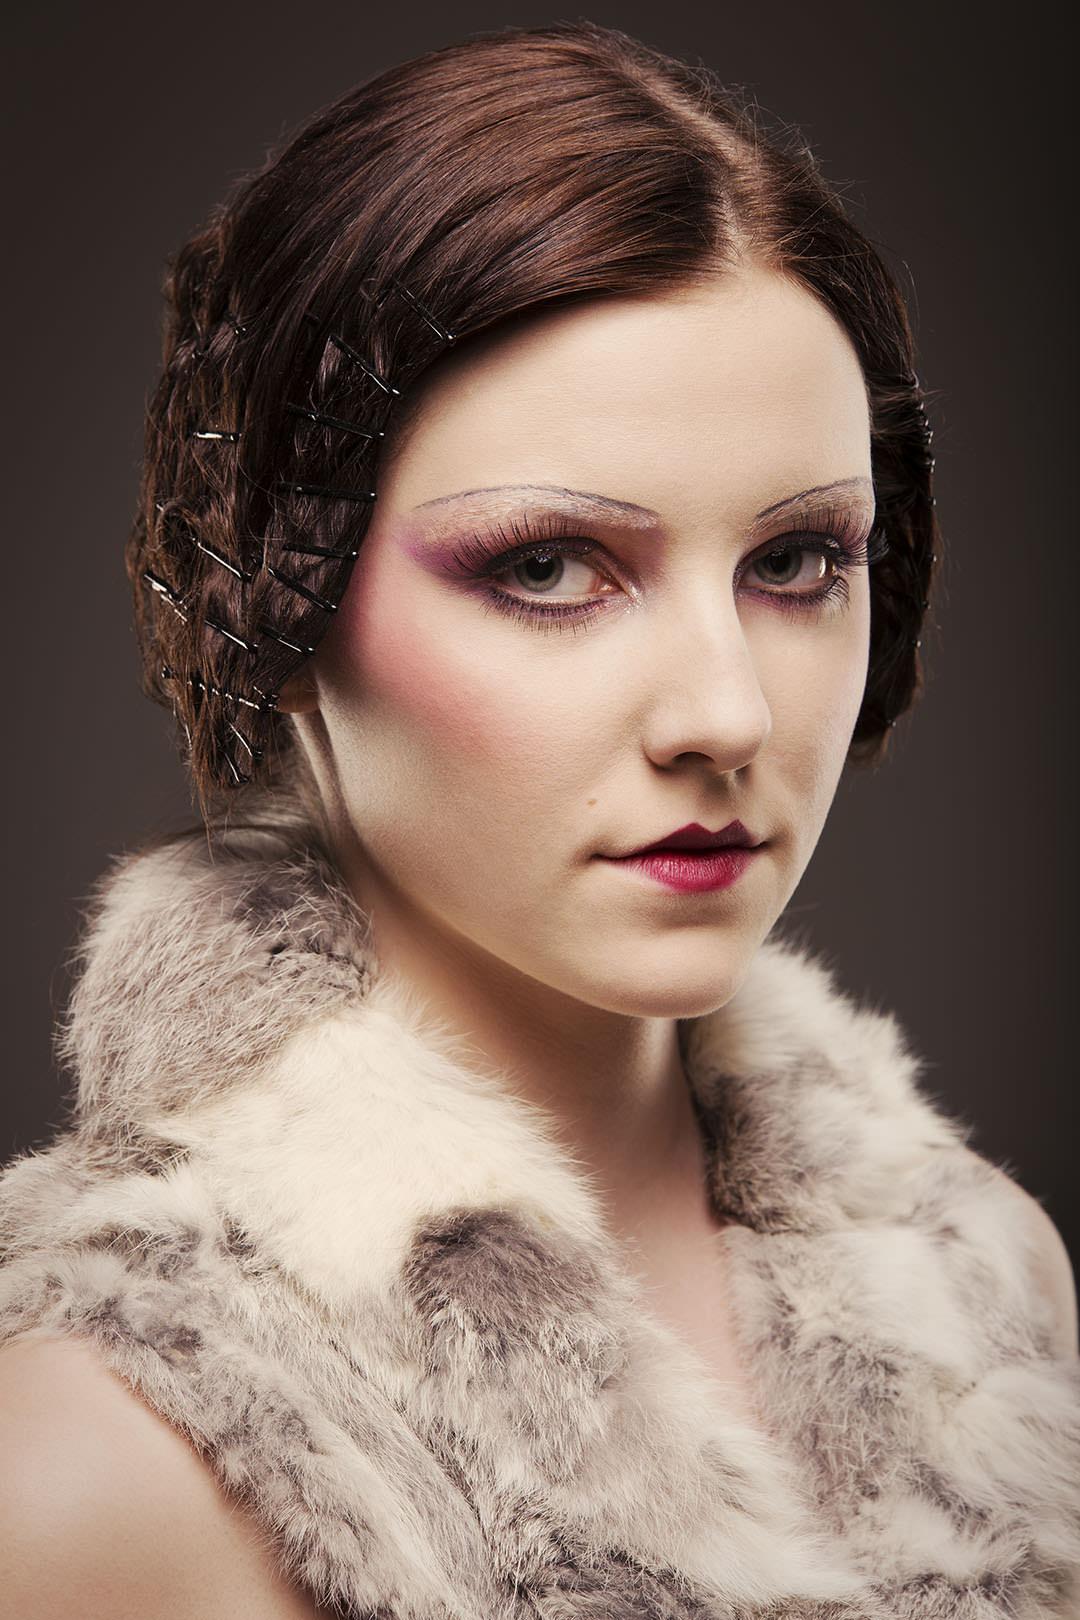 Magdalena_Dziadkowiak-Stefaniak_make_up_02